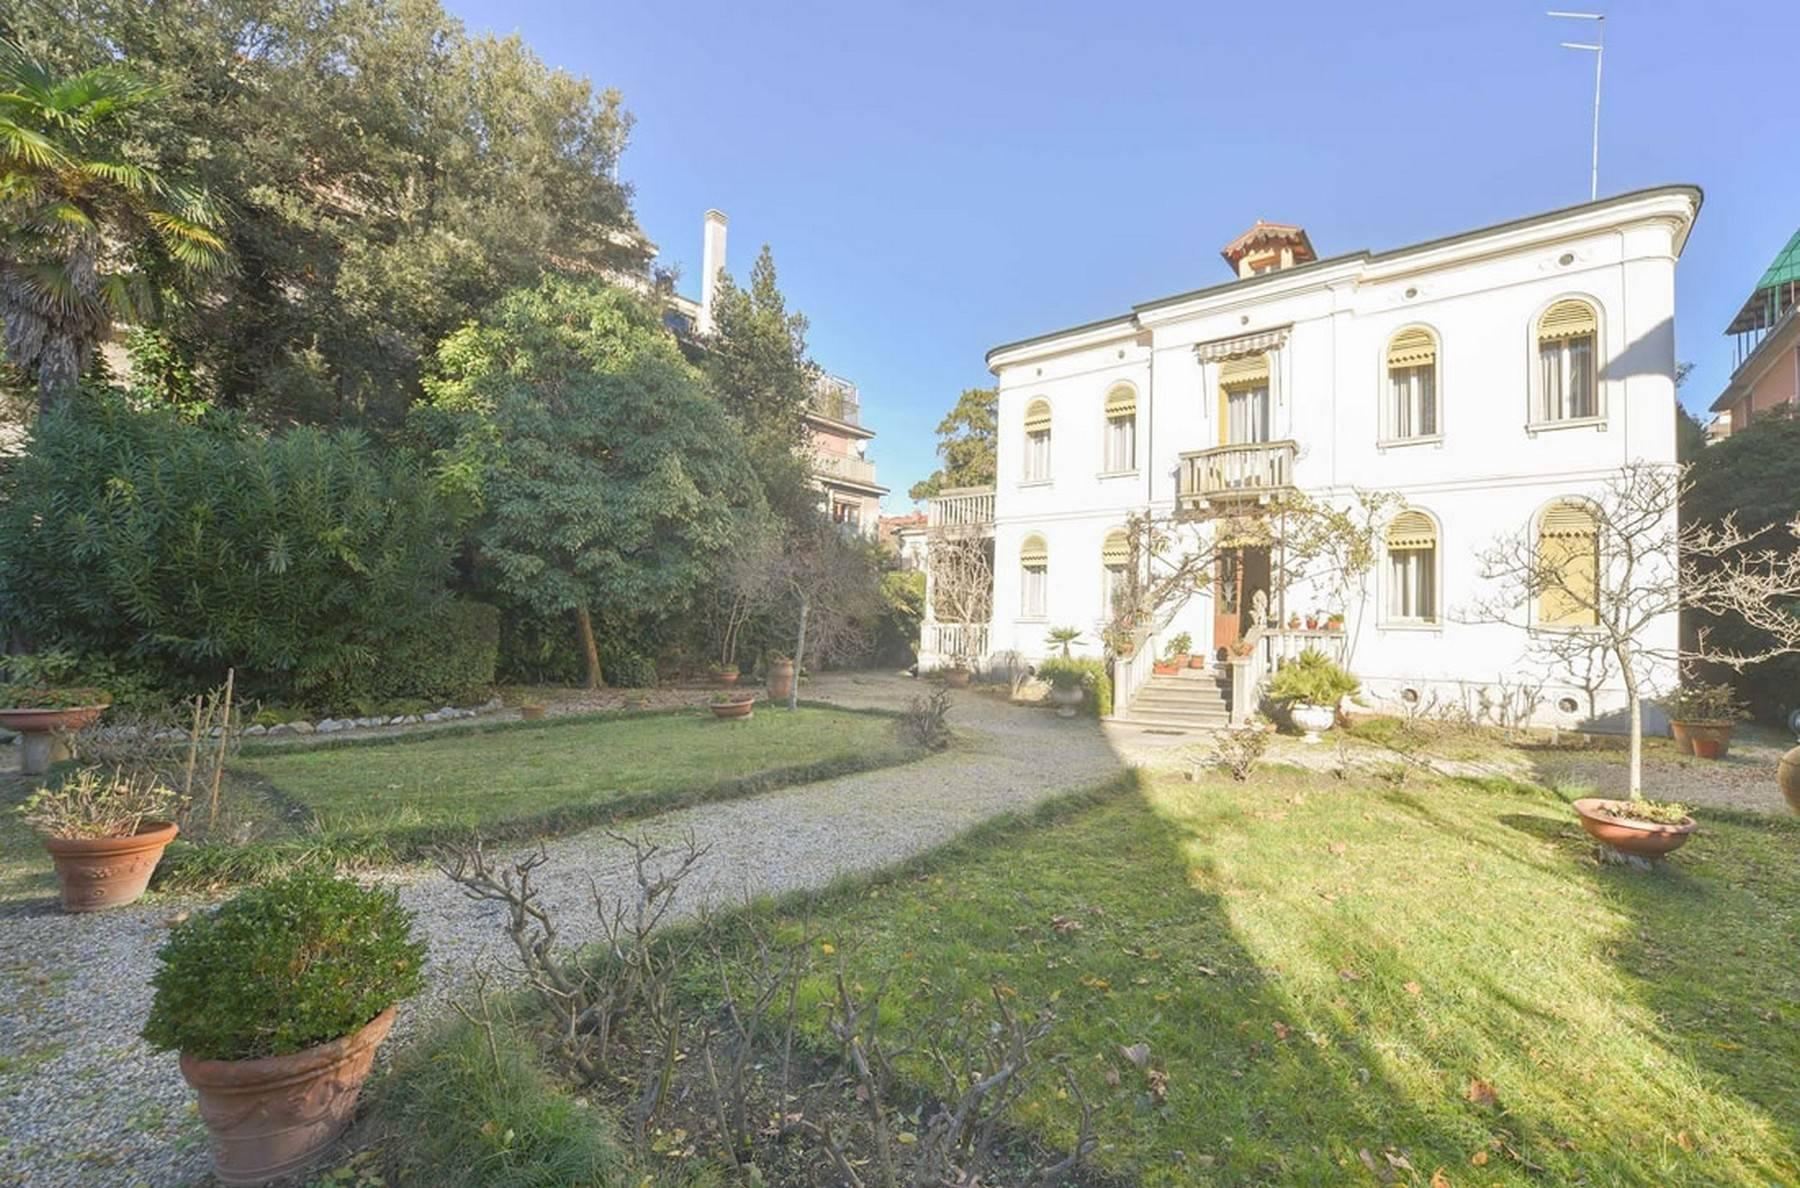 Villa Bianca im Stadtteil Lido - 1